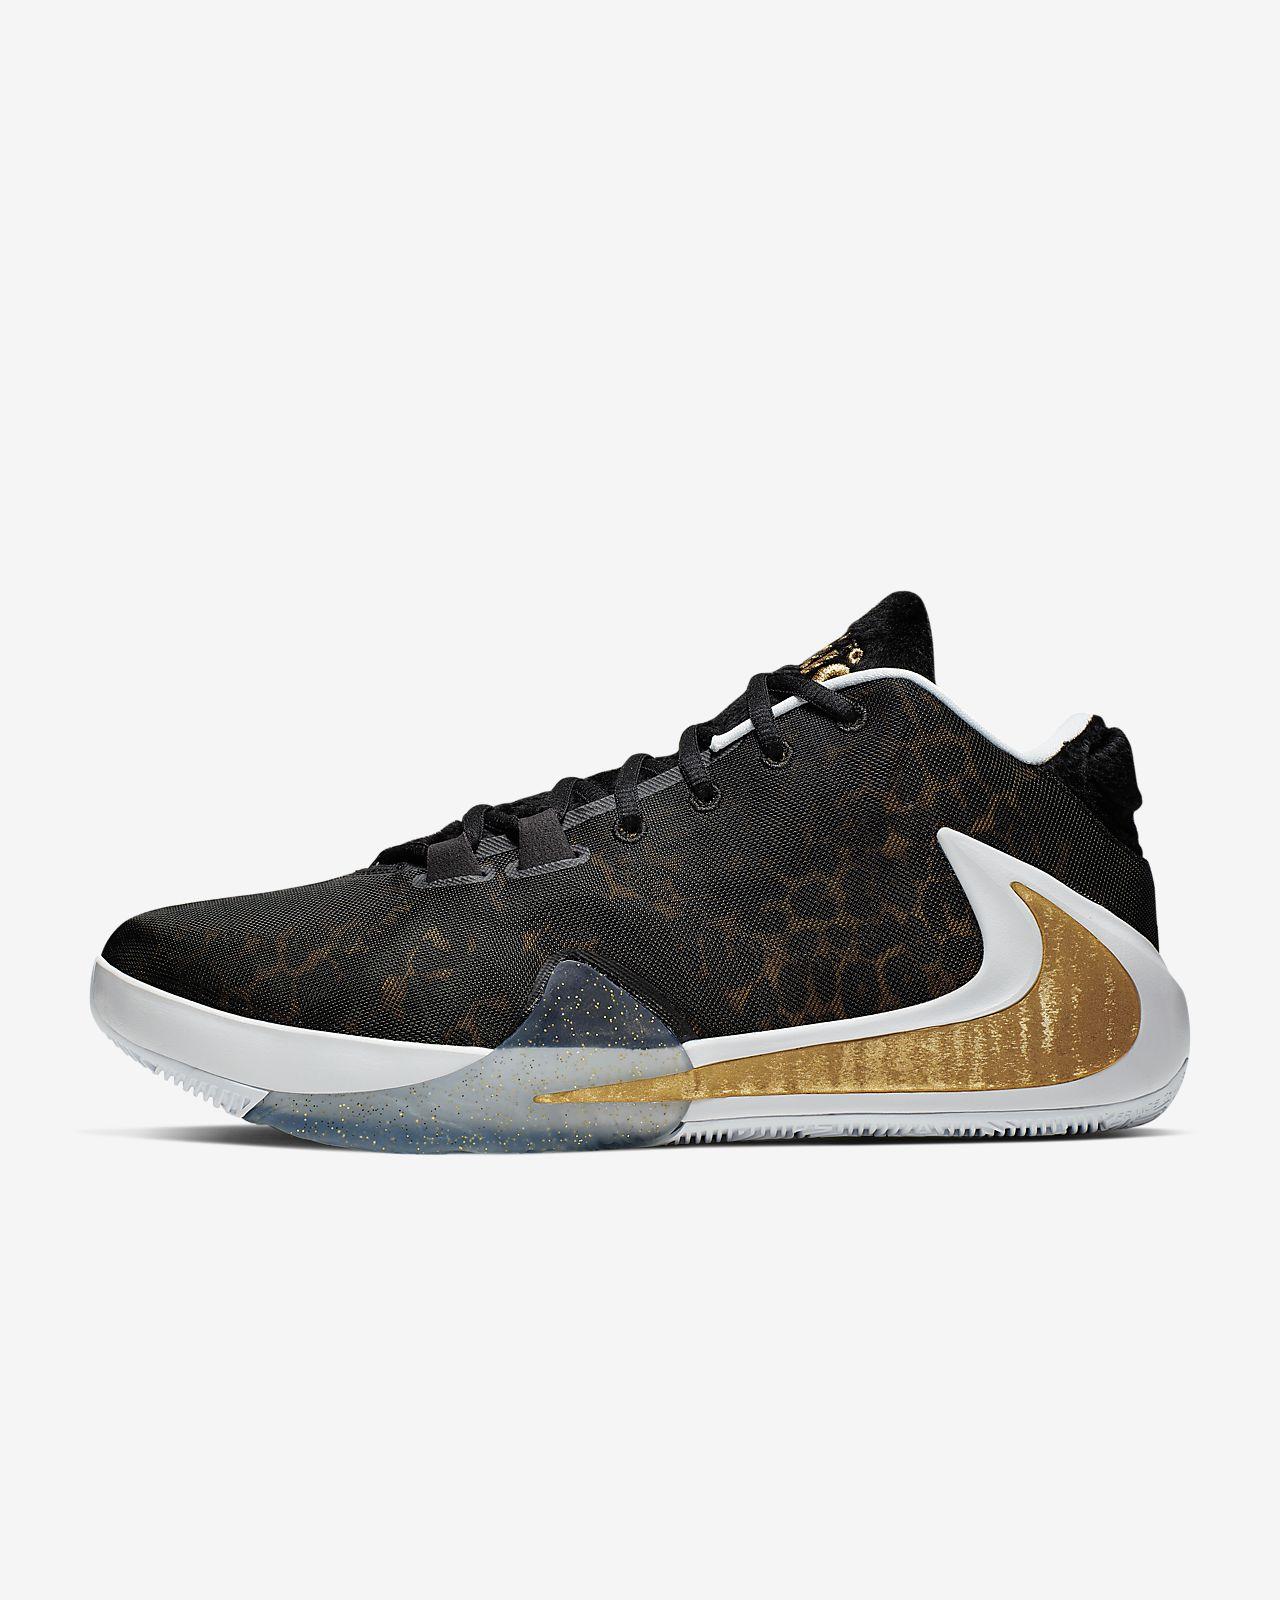 Zoom Freak 1 'Coming to America' Basketball Shoe